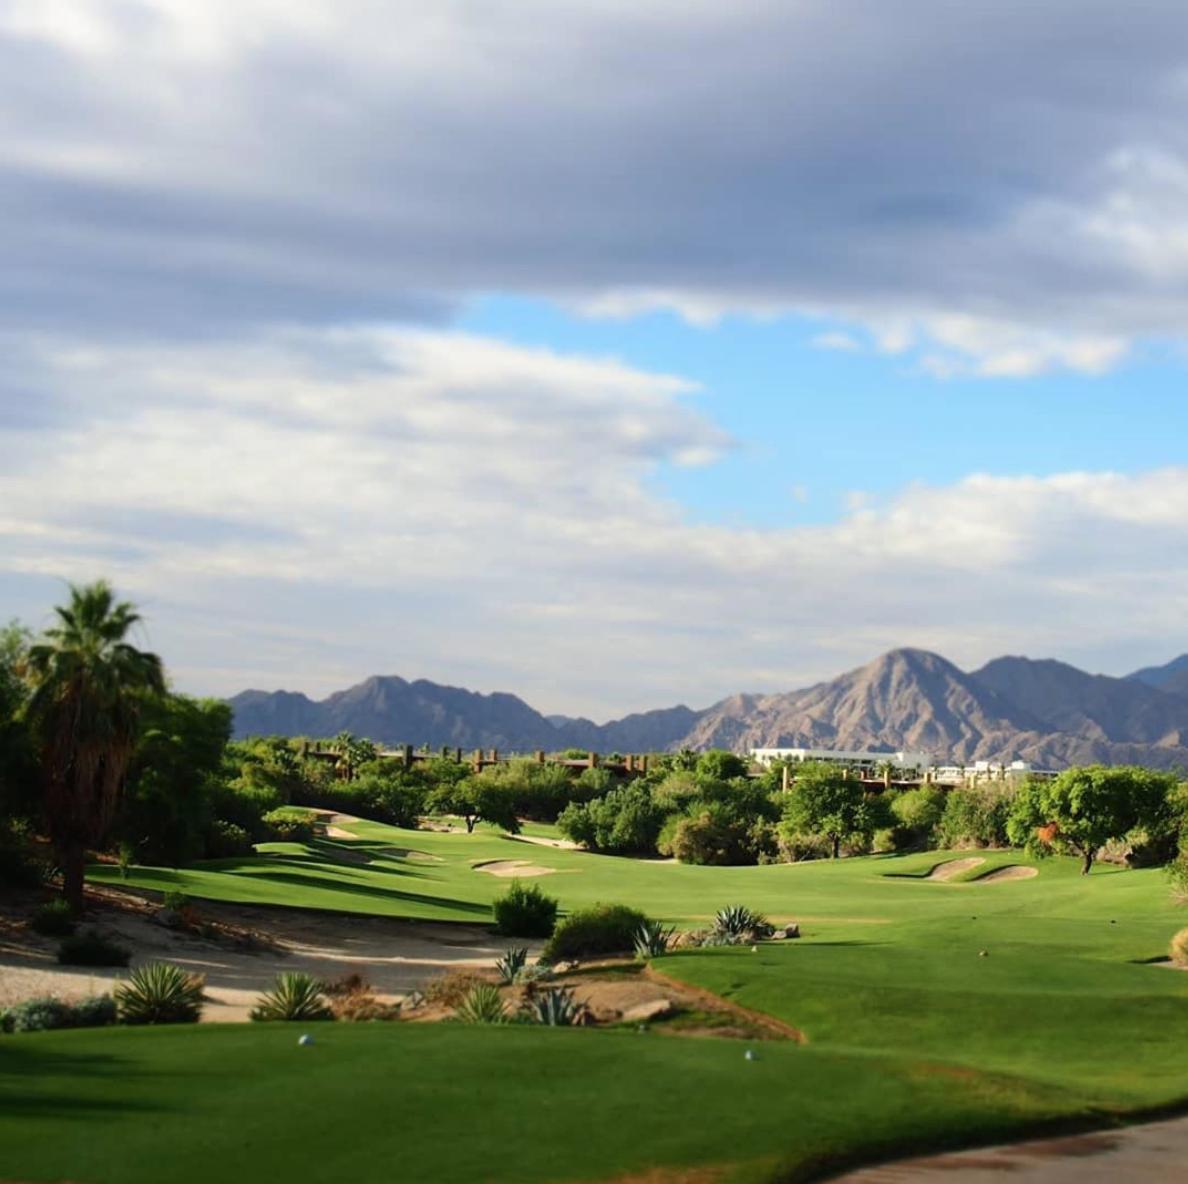 image credit:  Desert Willow Golf Resort instagram